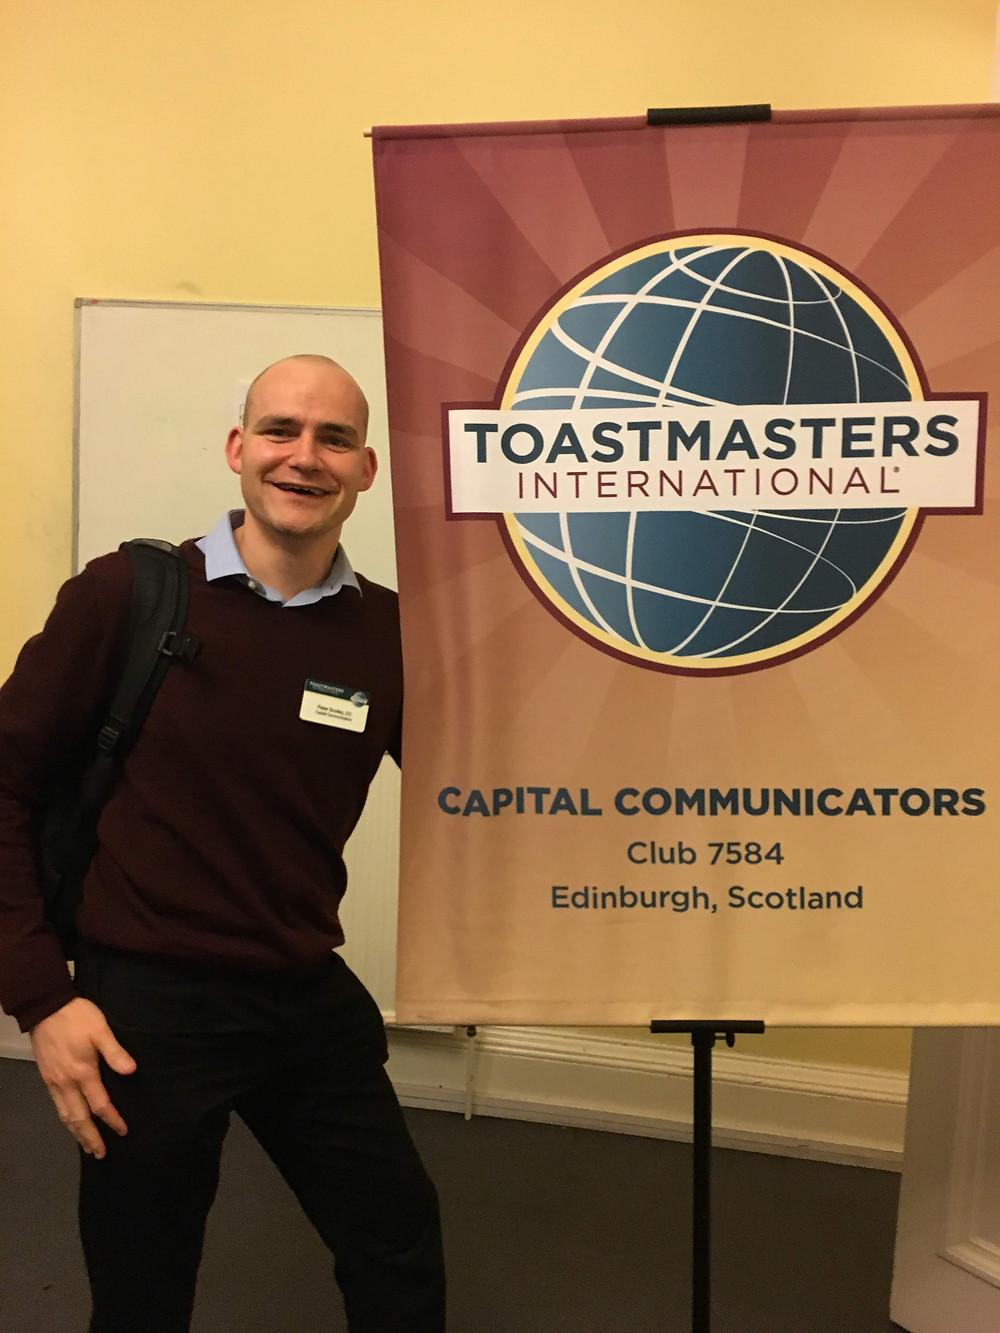 Capital Communicators Toastmasters International Edinburgh, Scotland Club 7584